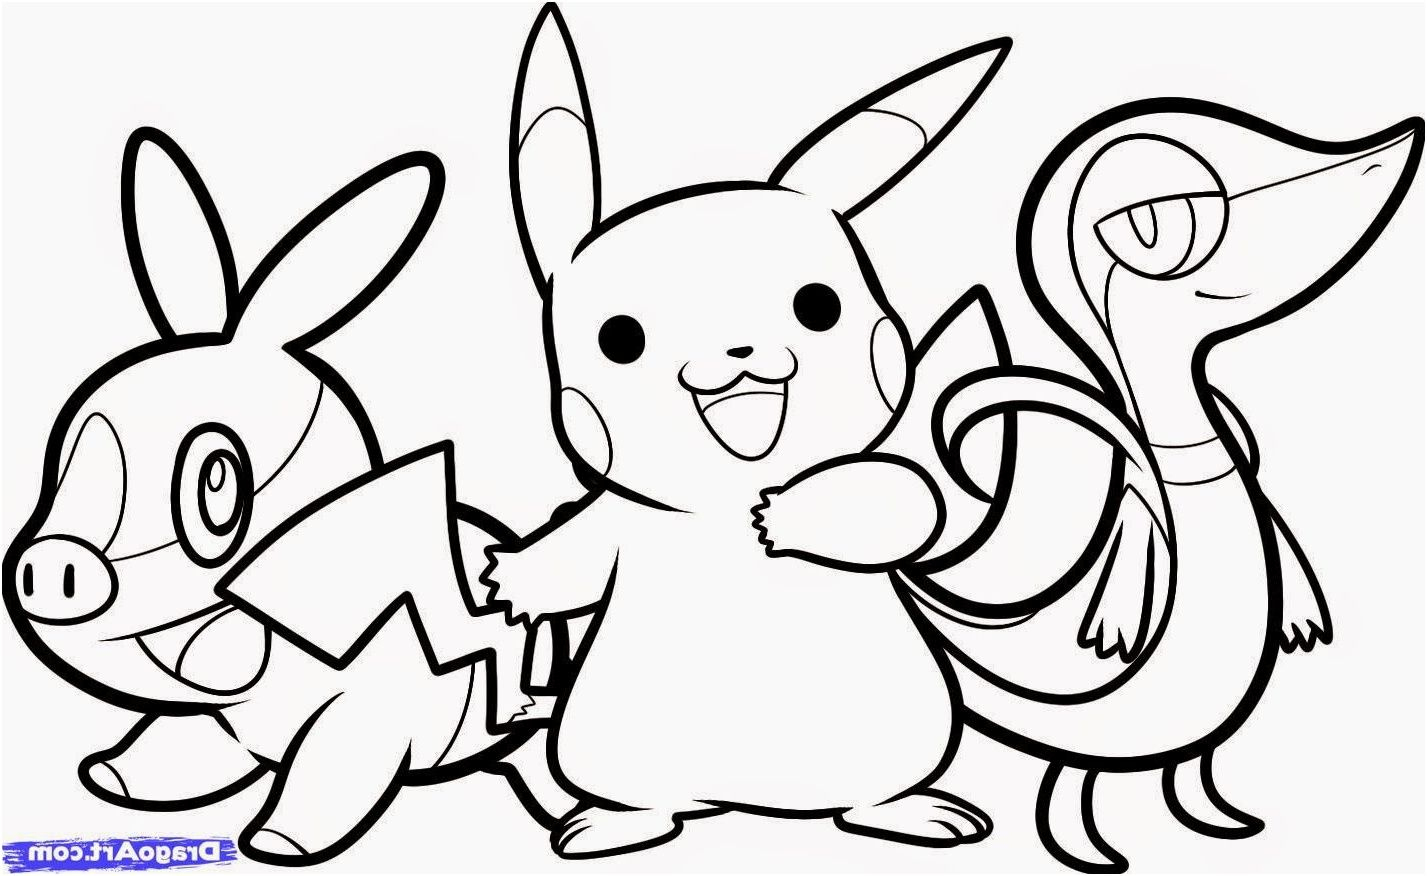 9 Classique Coloriage Pokemon Gratuit Gallery tout Coloriage De Pokémon Gratuit